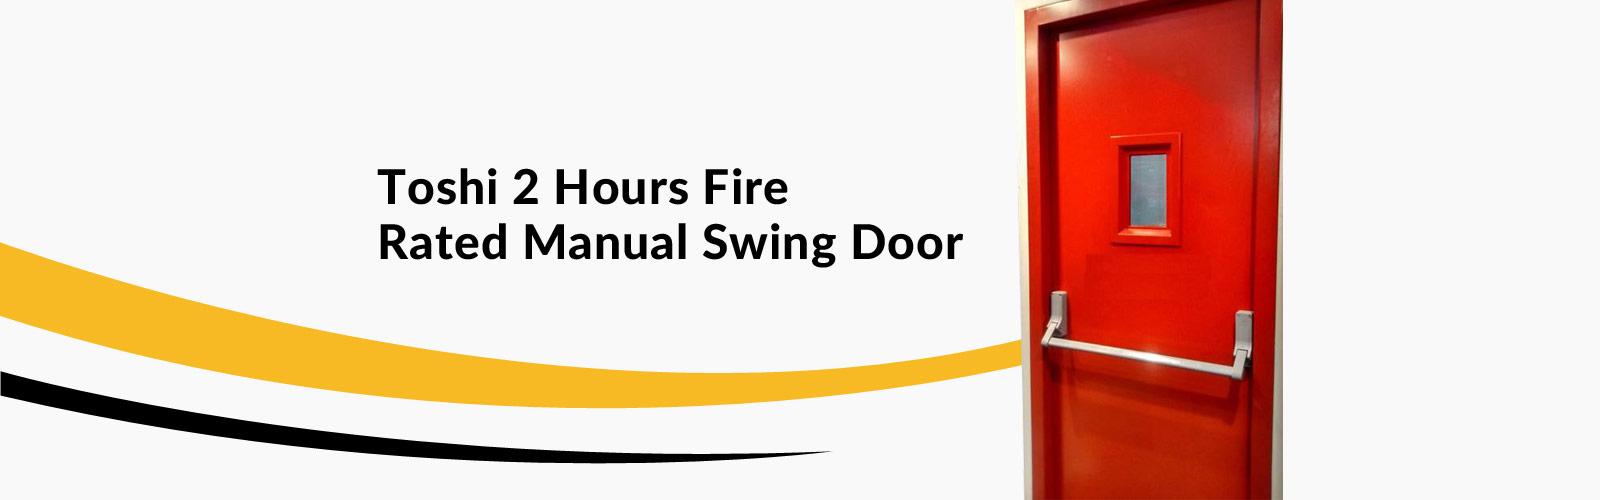 Fire Rated <span> Manual Swing Door